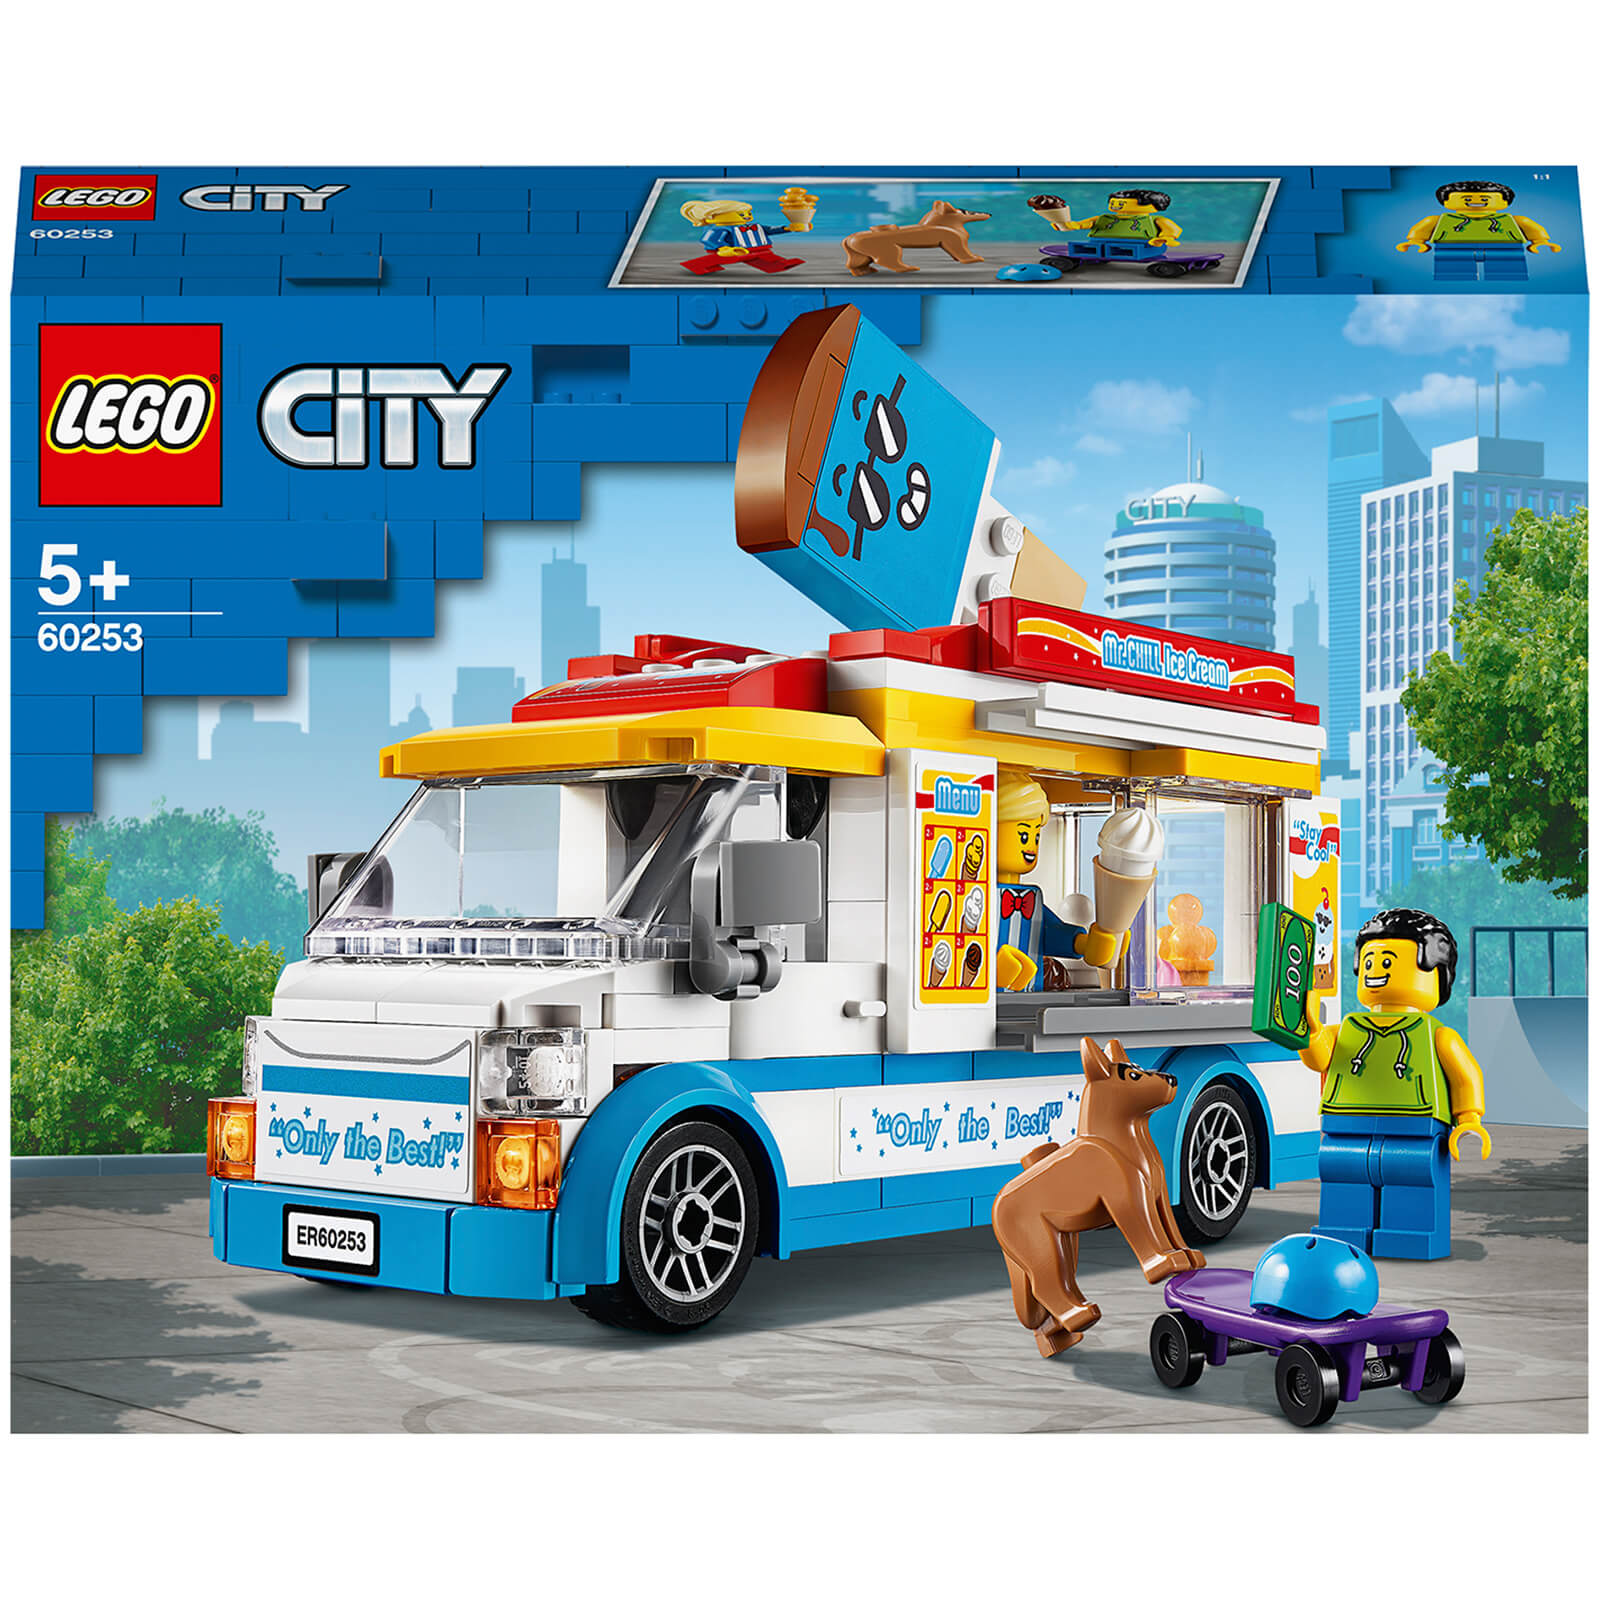 LEGO City: Great Vehicles Ice Cream Truck Building Set (60253)